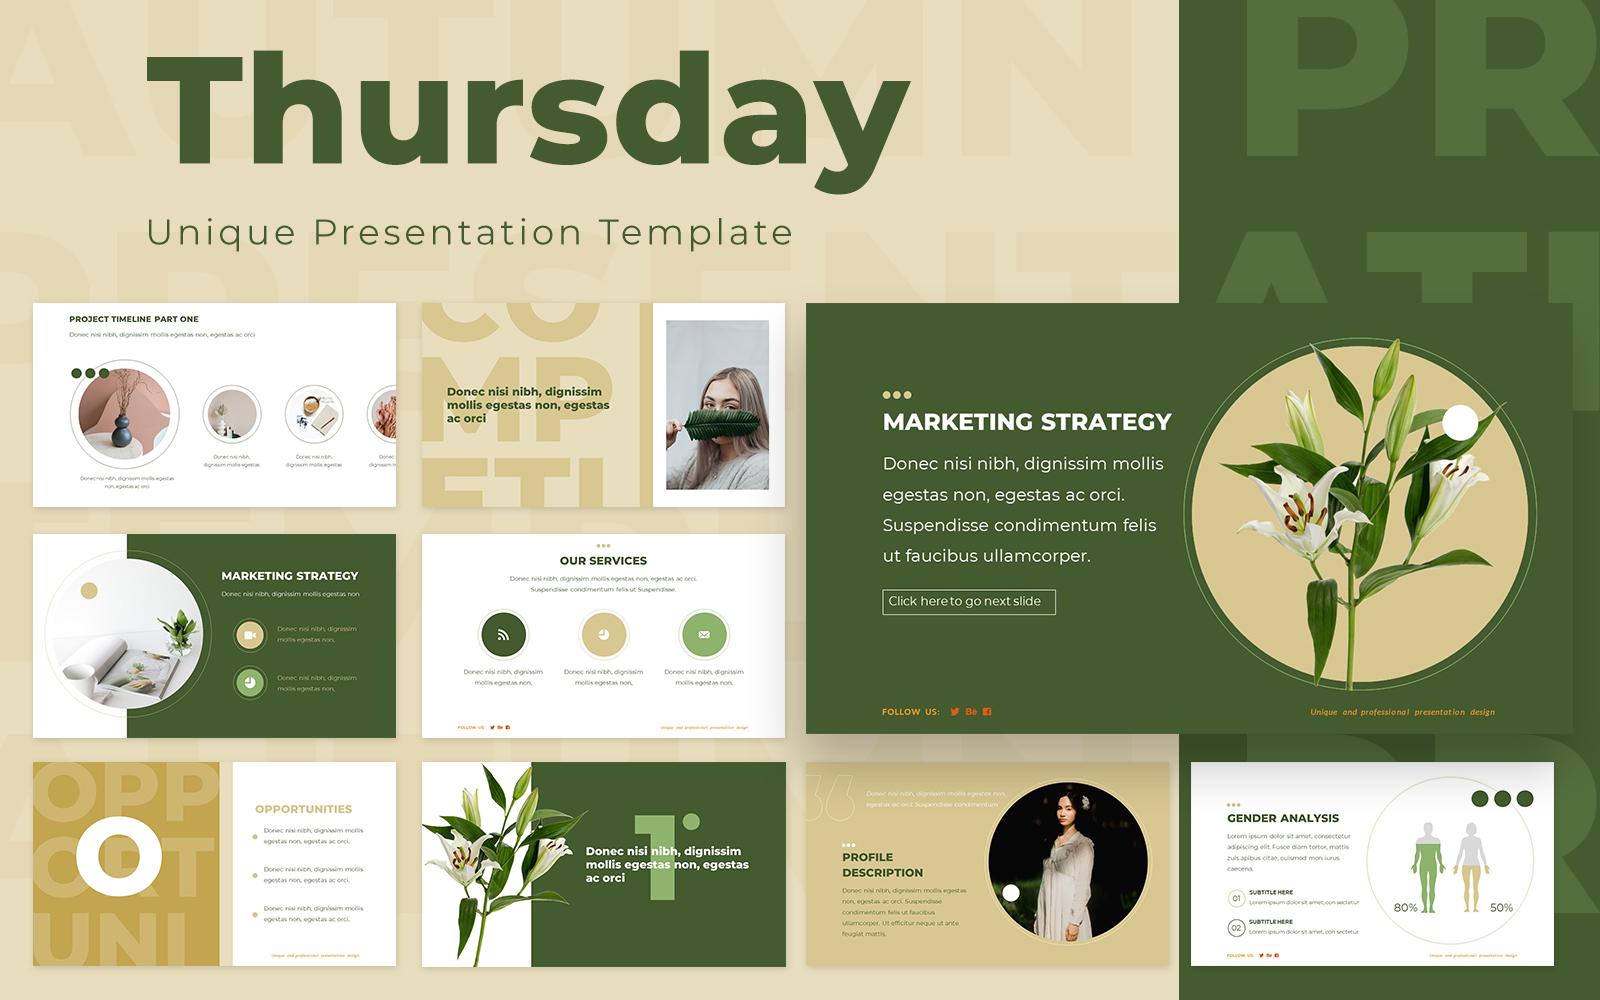 Thursday Powerpoint Presentation Template